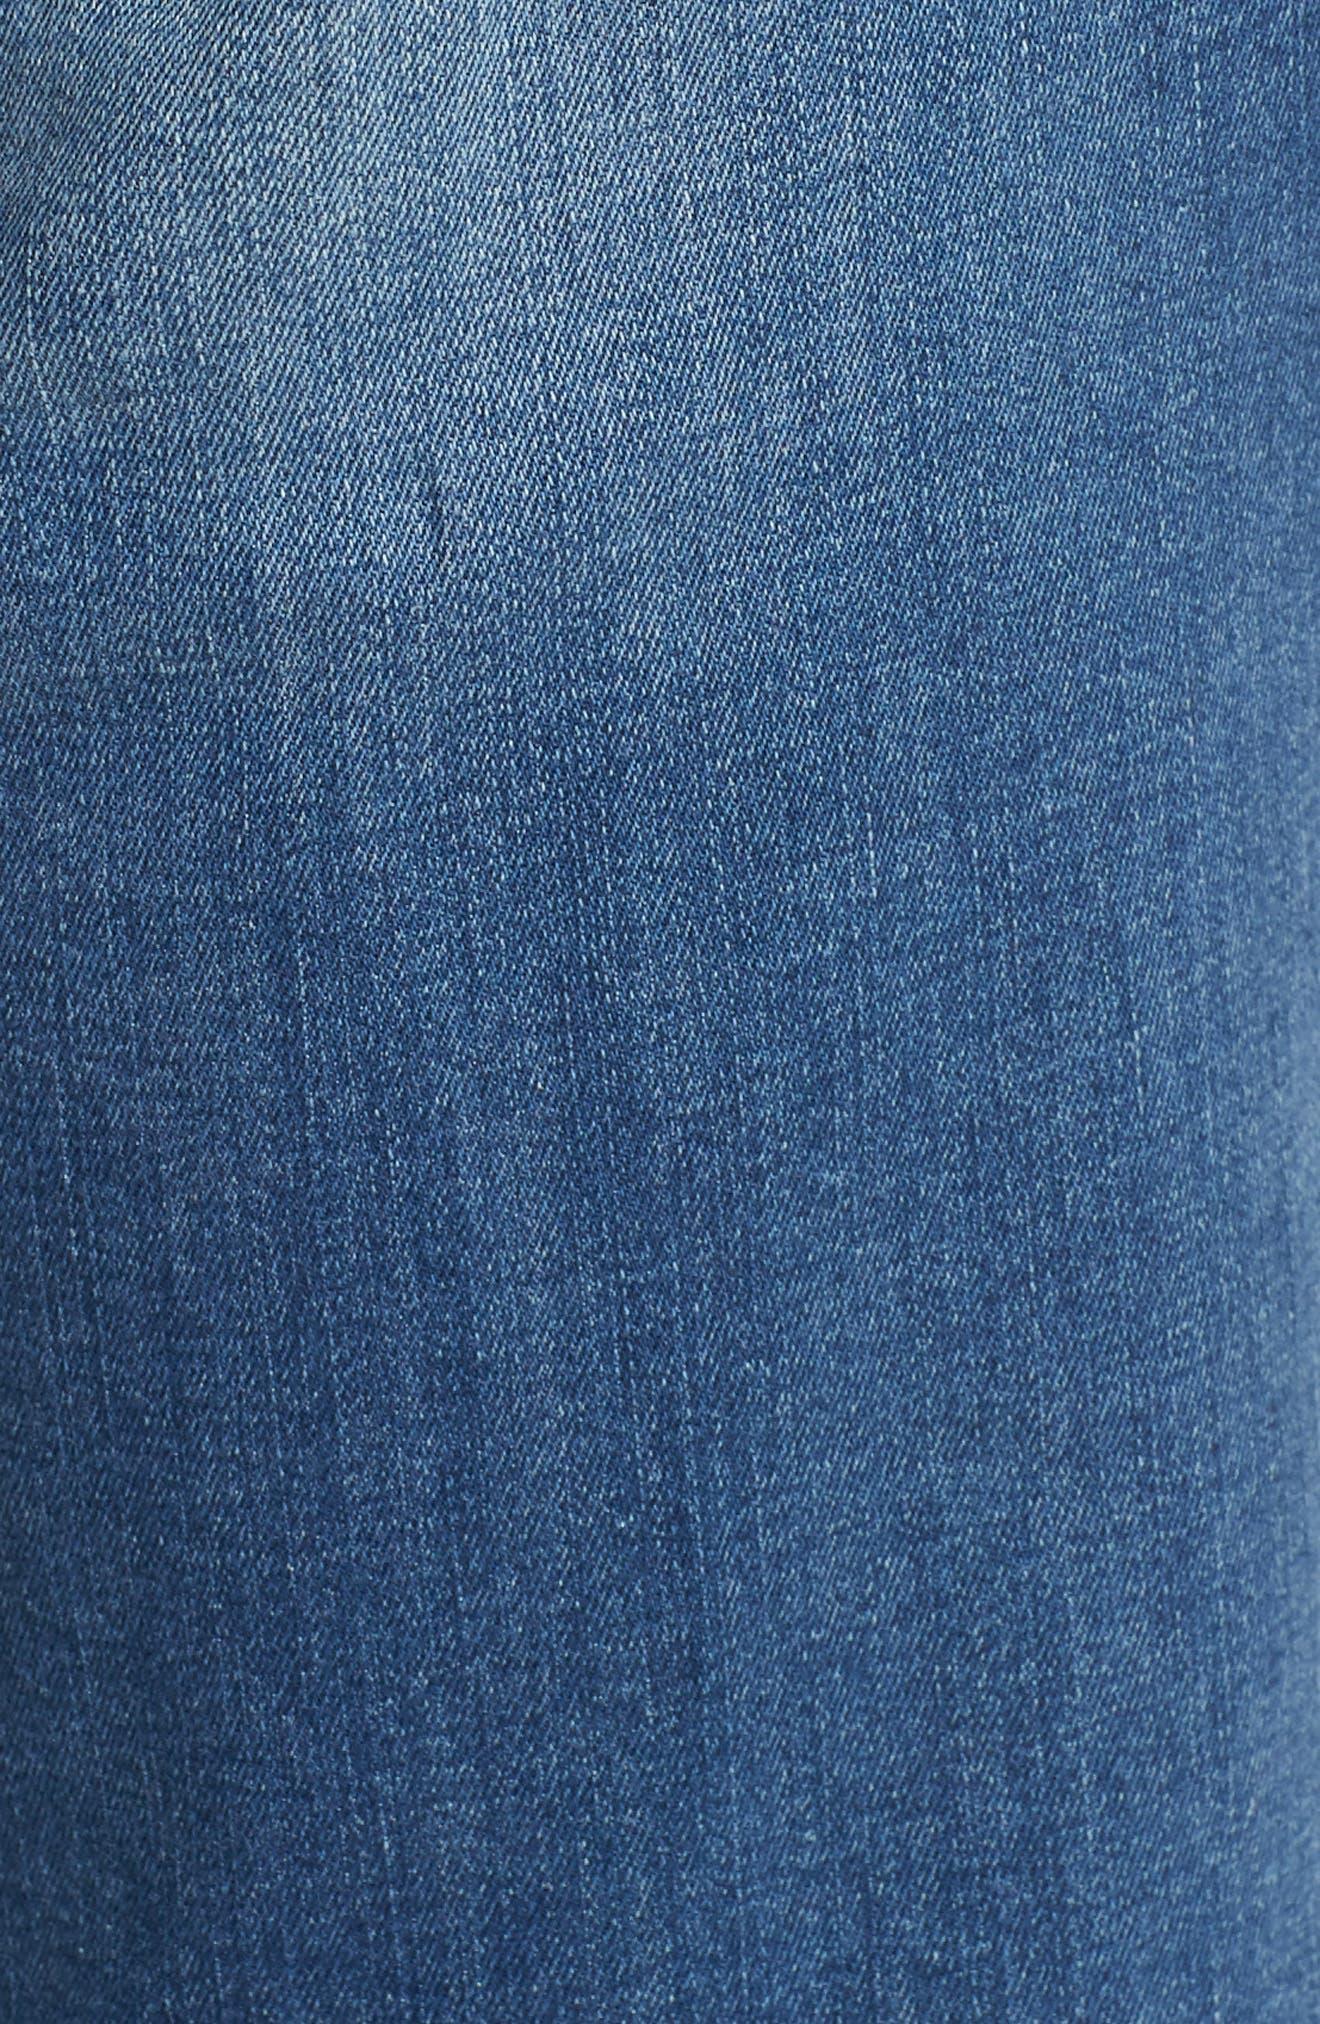 Emma Slim Boyfriend Jeans,                             Alternate thumbnail 6, color,                             INDIGO RIPPED NOLITA